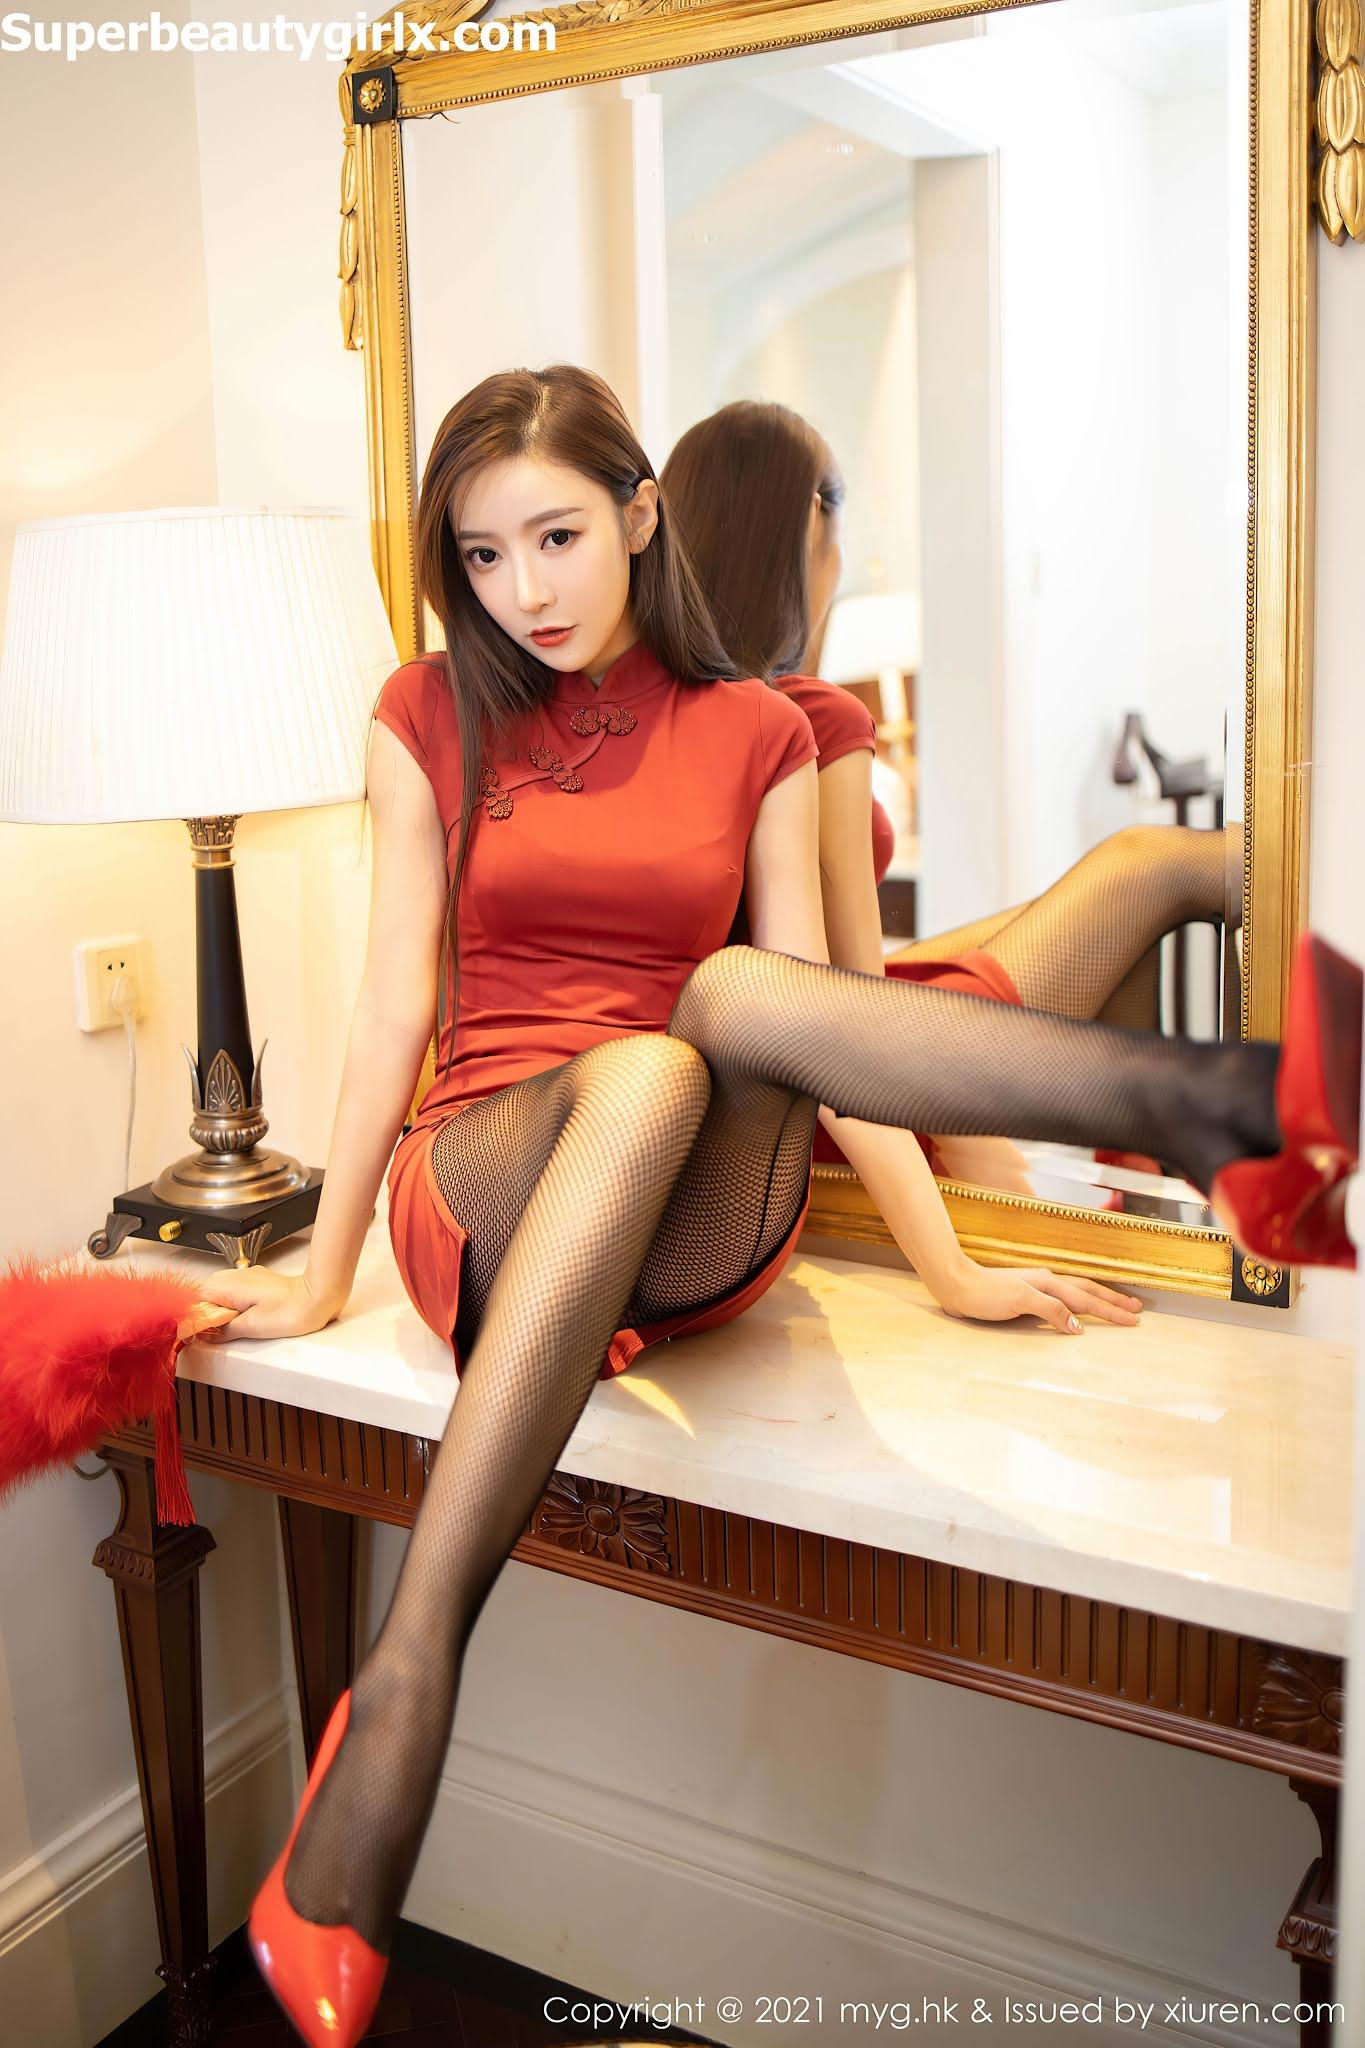 MyGirl-Vol.498-Yanni-Wang-Xin-Yao-Superbeautygirlx.com